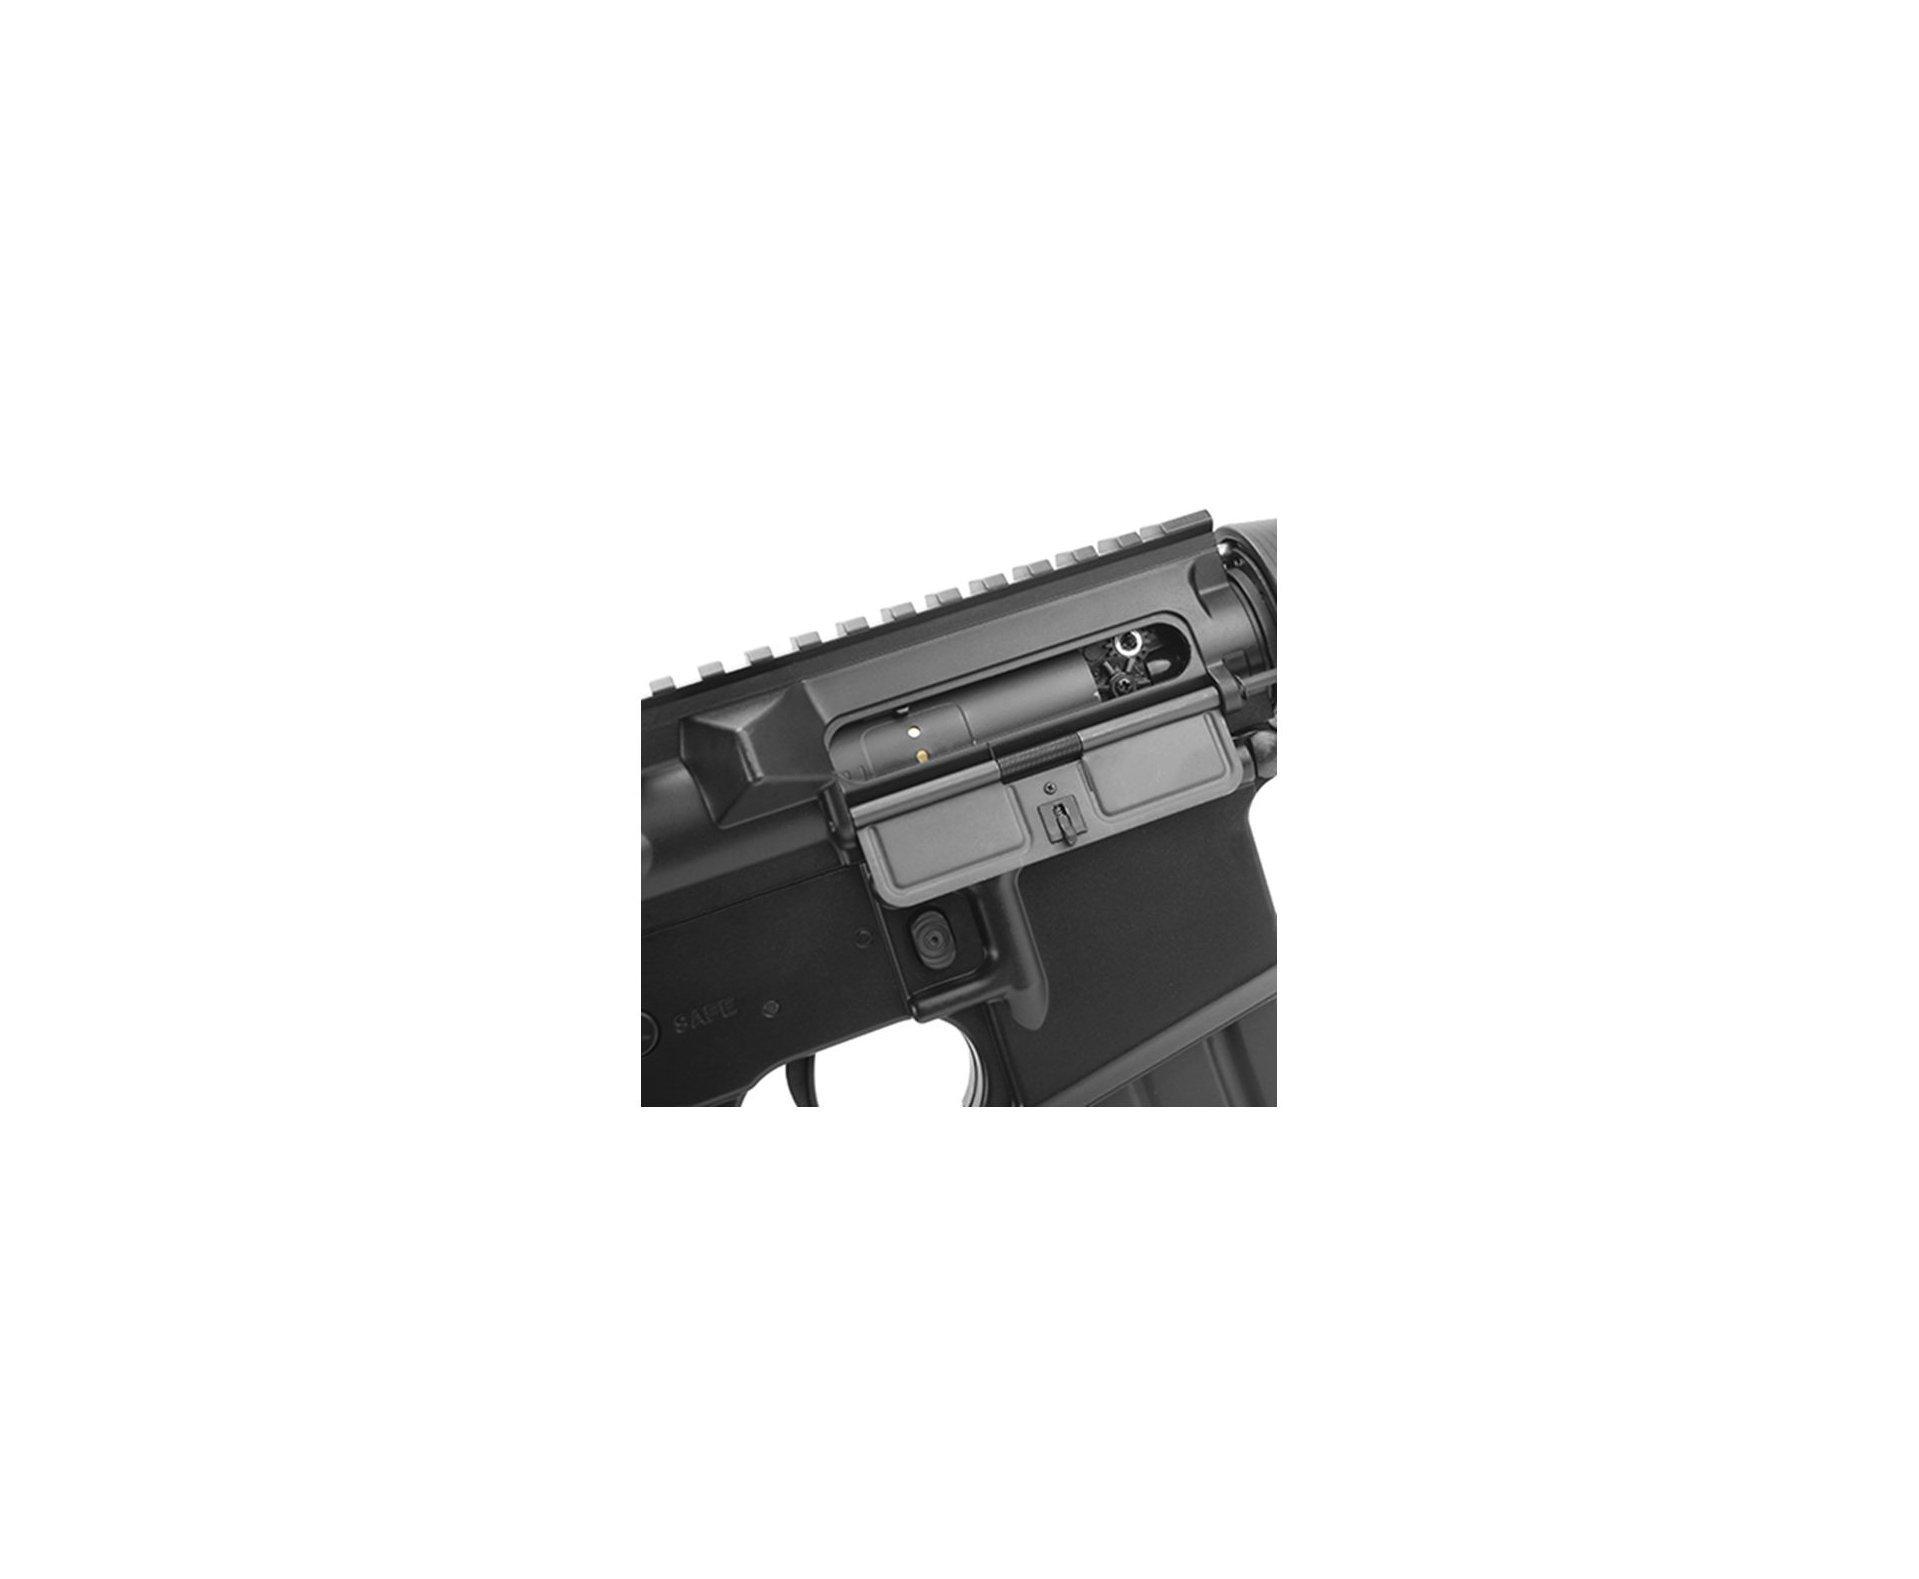 Rifle De Airsoft M4a1 Advance Full Metal Cal 6.0mm - King Arms